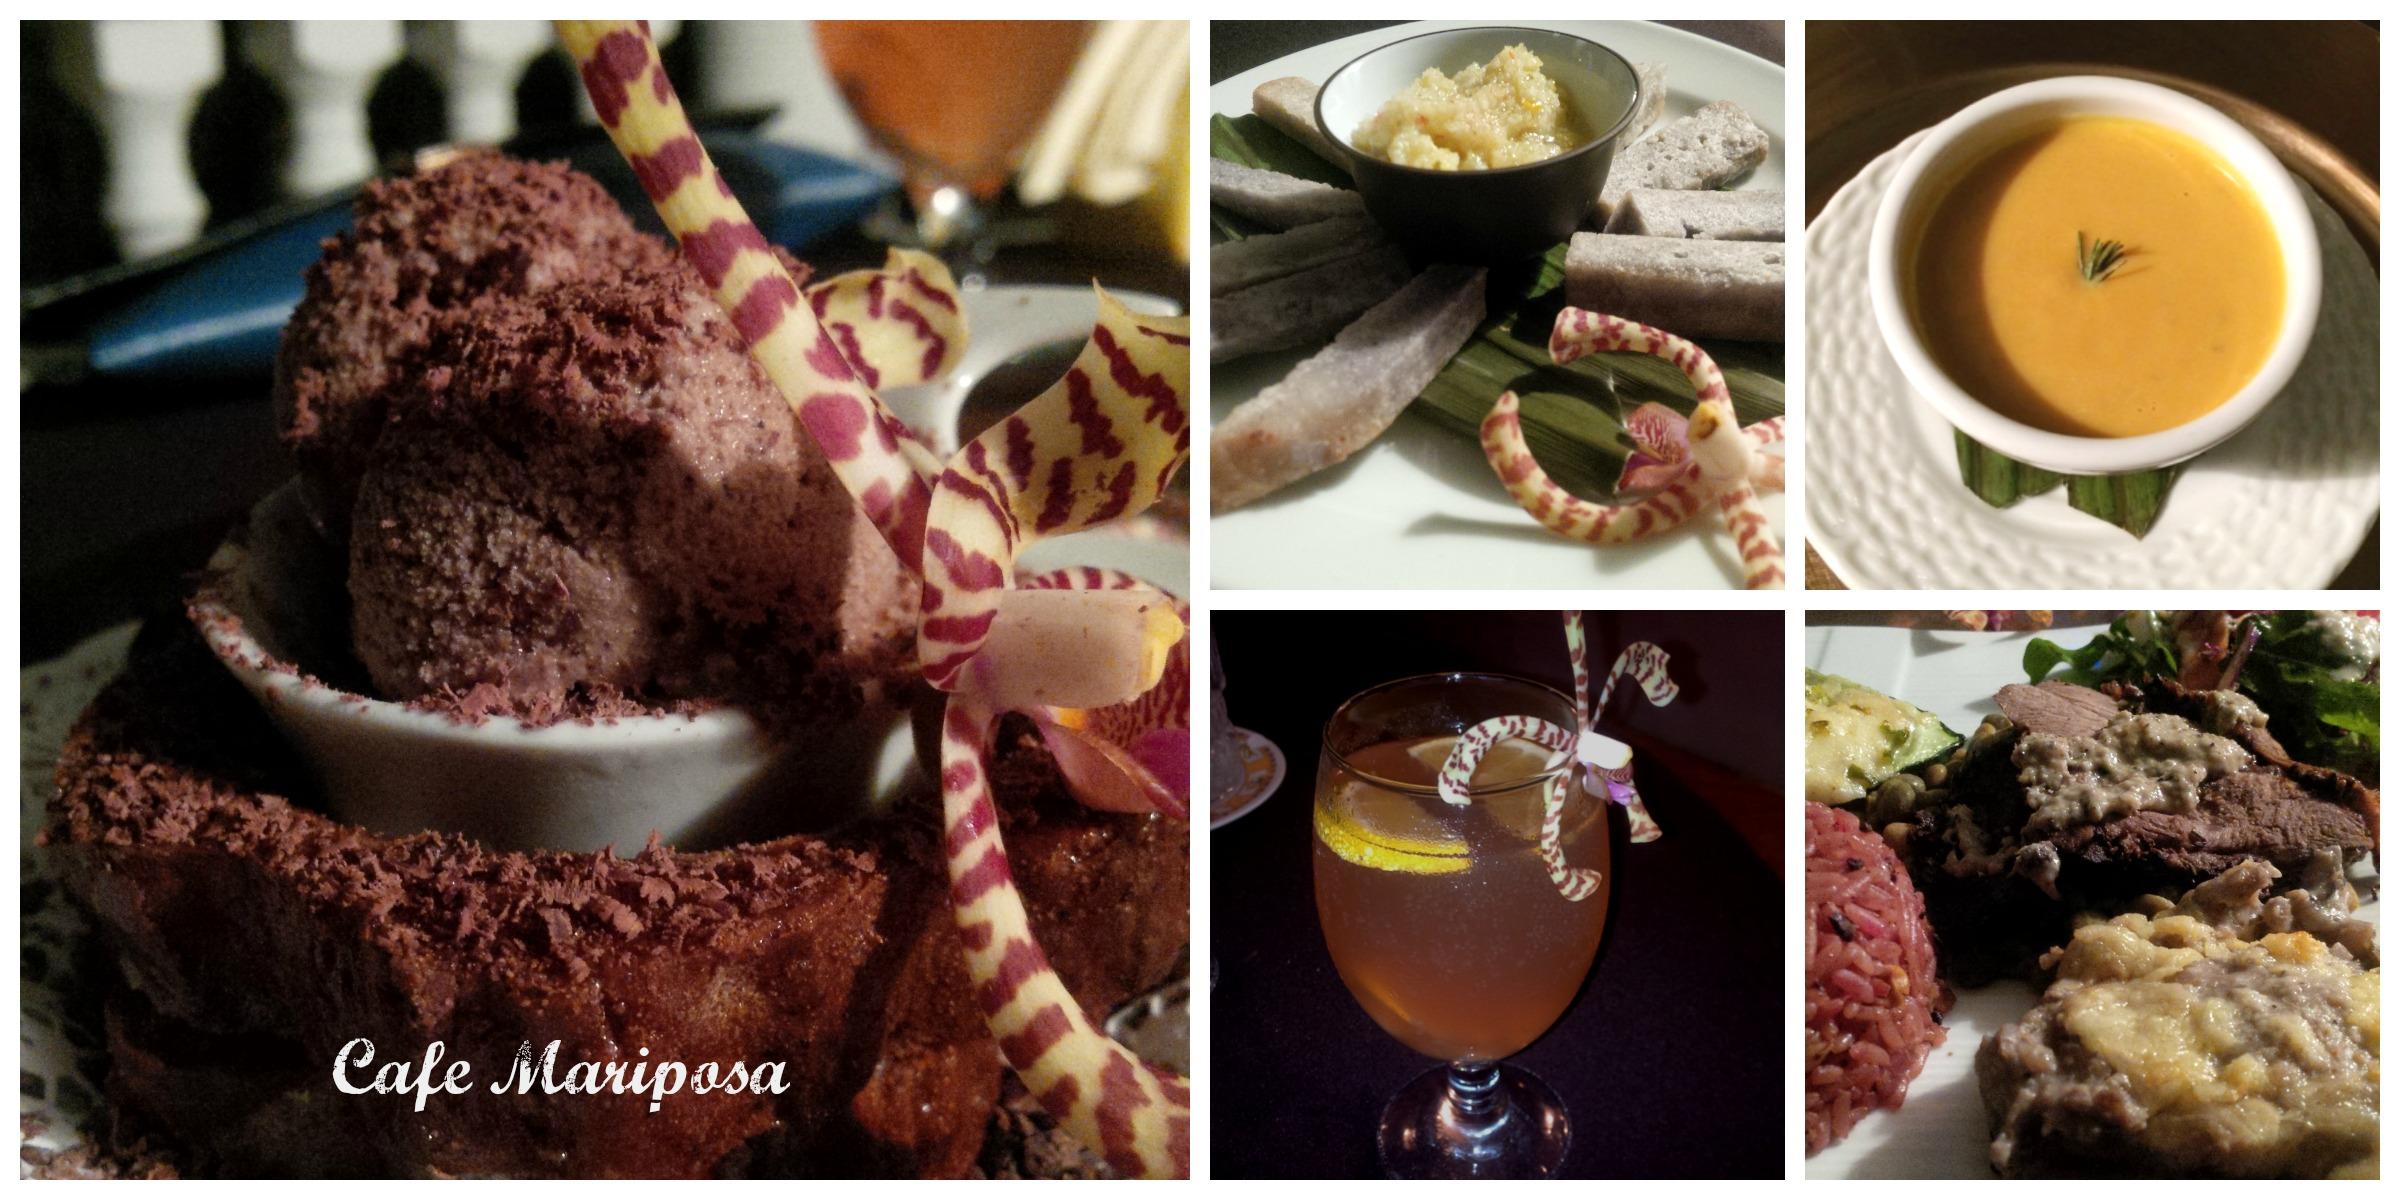 Cafe Mariposa